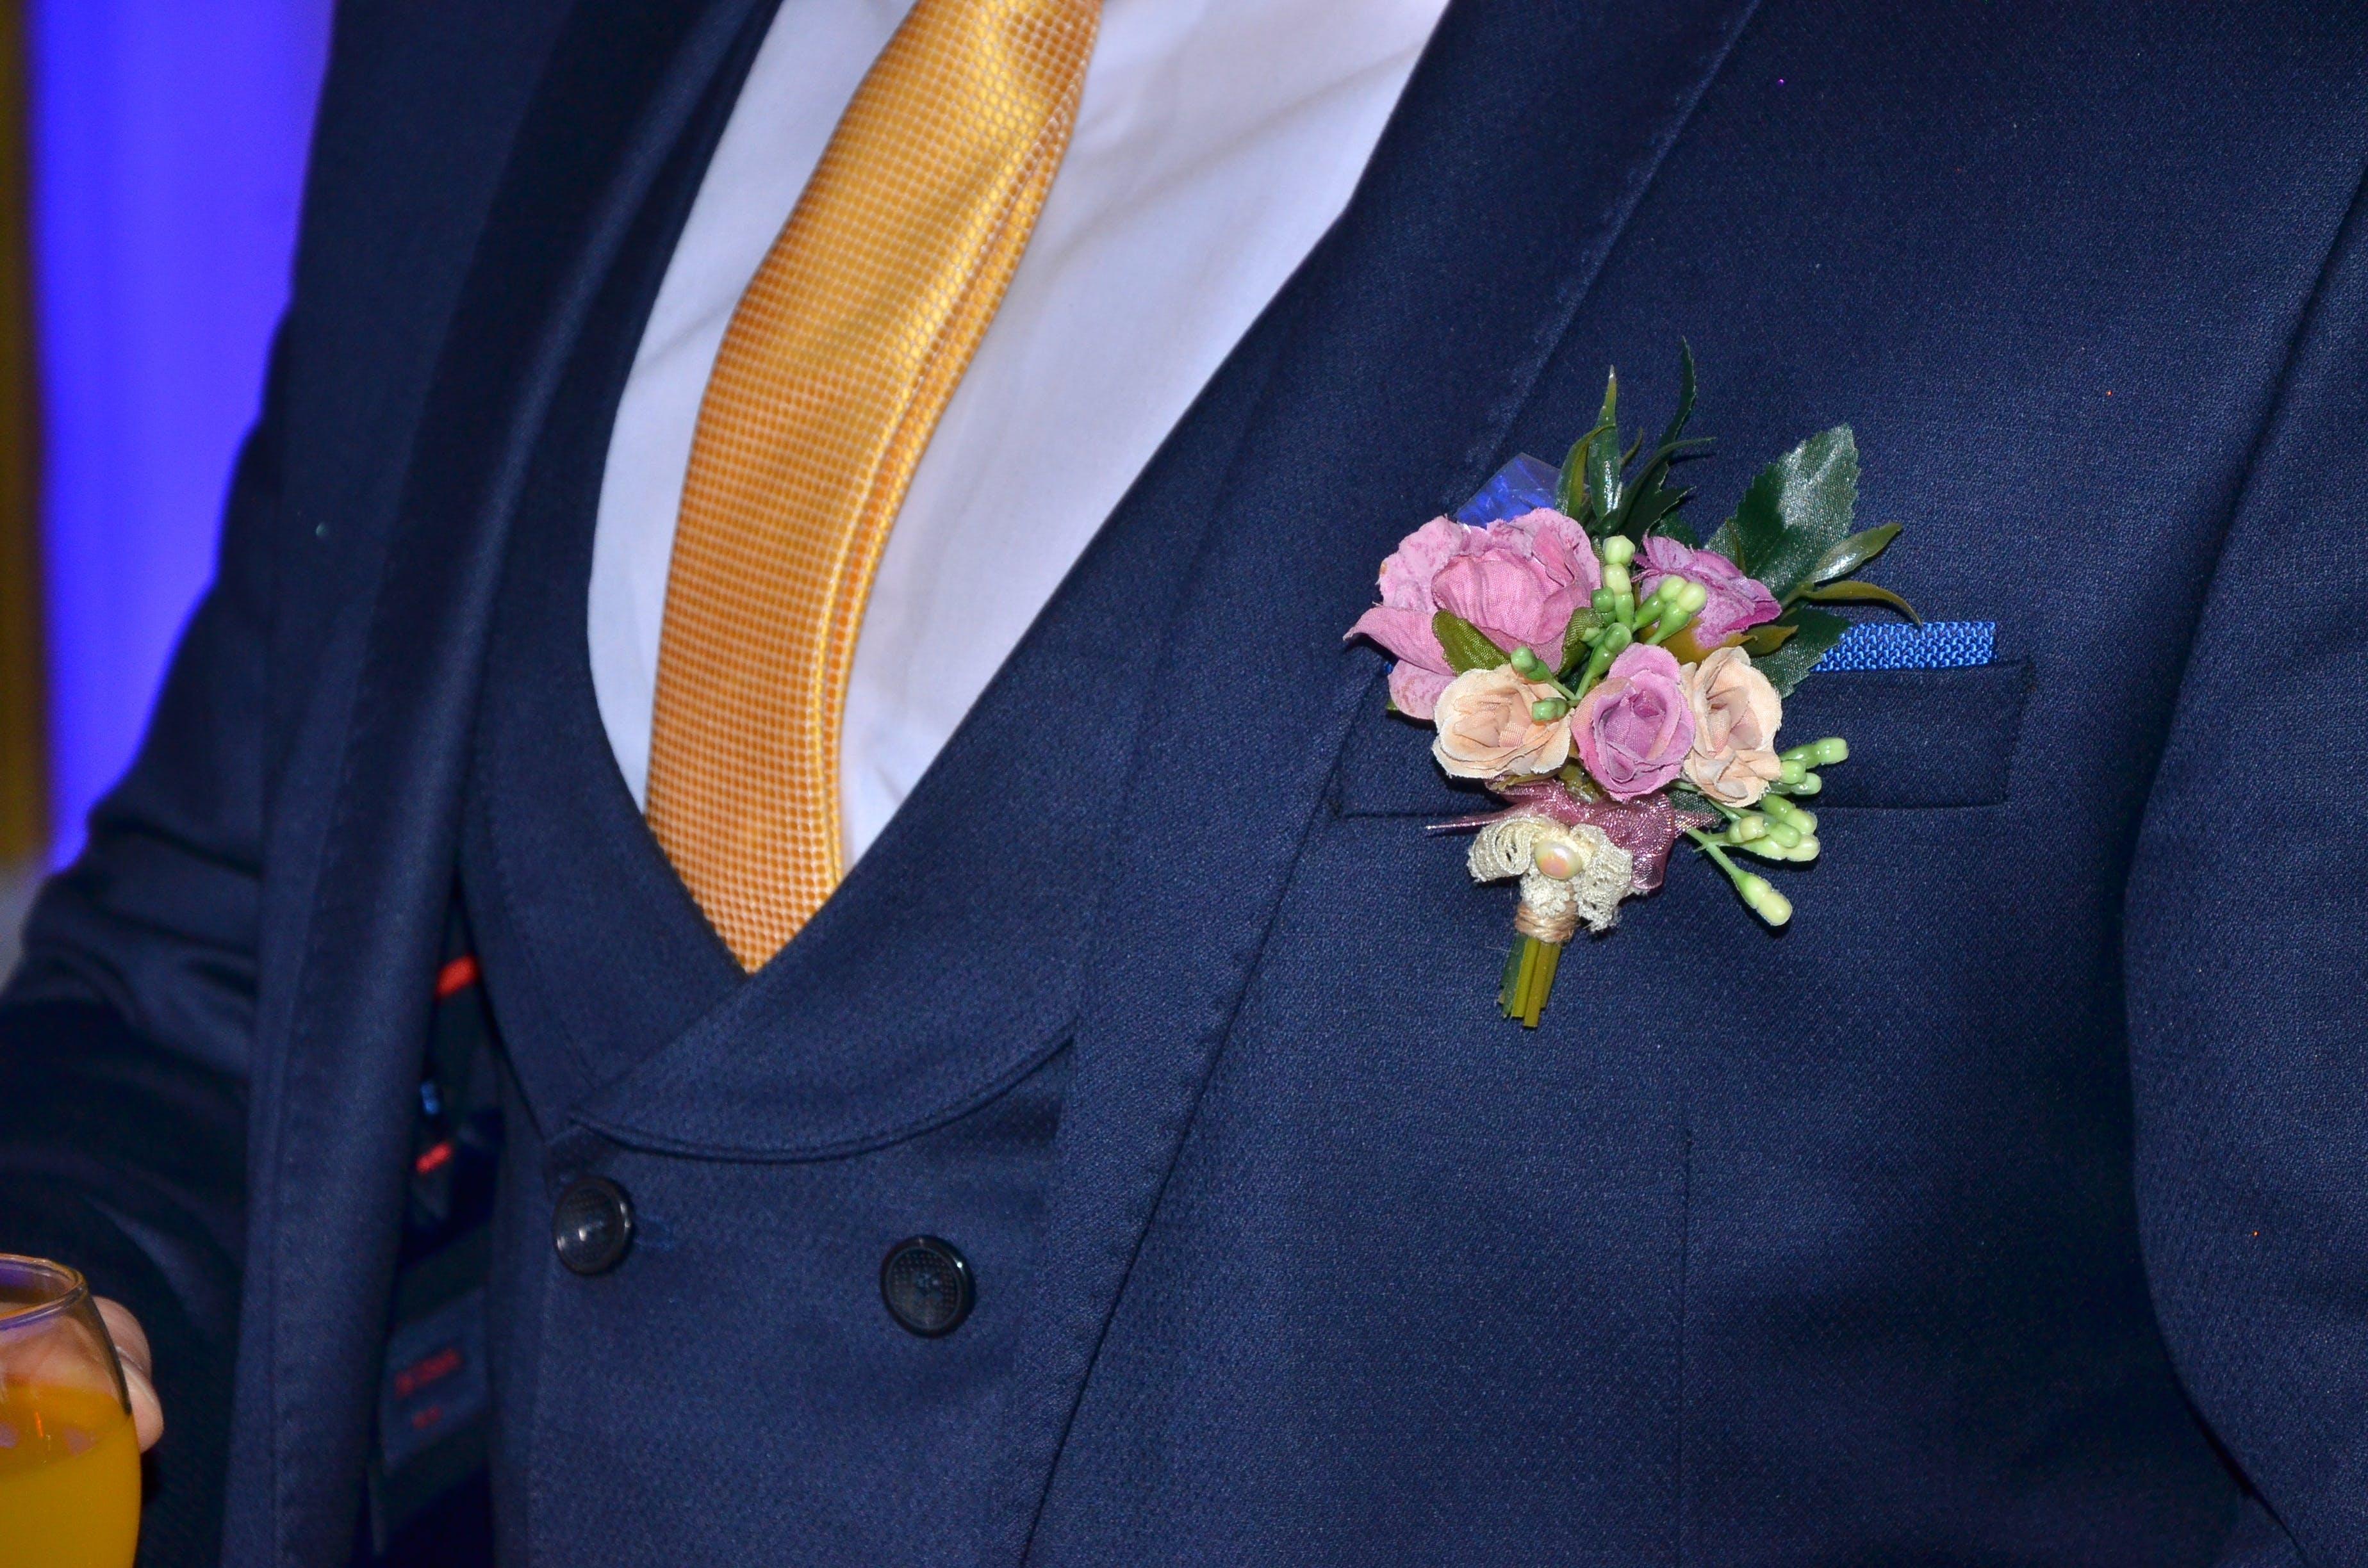 Kostenloses Stock Foto zu fashion, mann, textur, krawatte